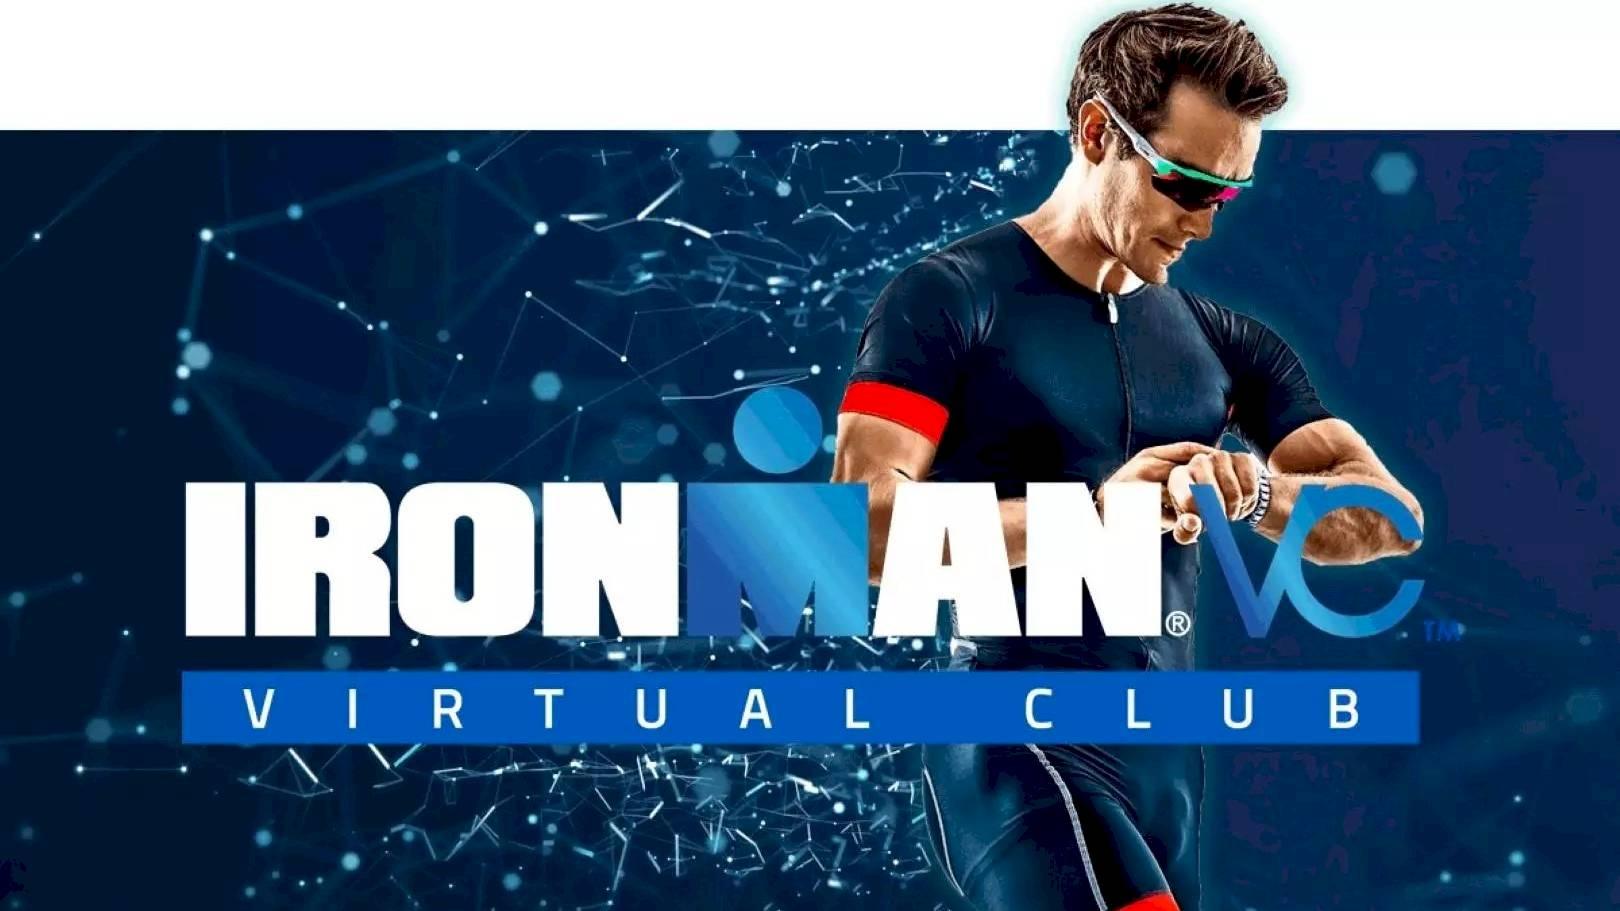 Geen grap: Ironman komt met triathlonplatform Virtual Club #AnywhereIsPossible - update